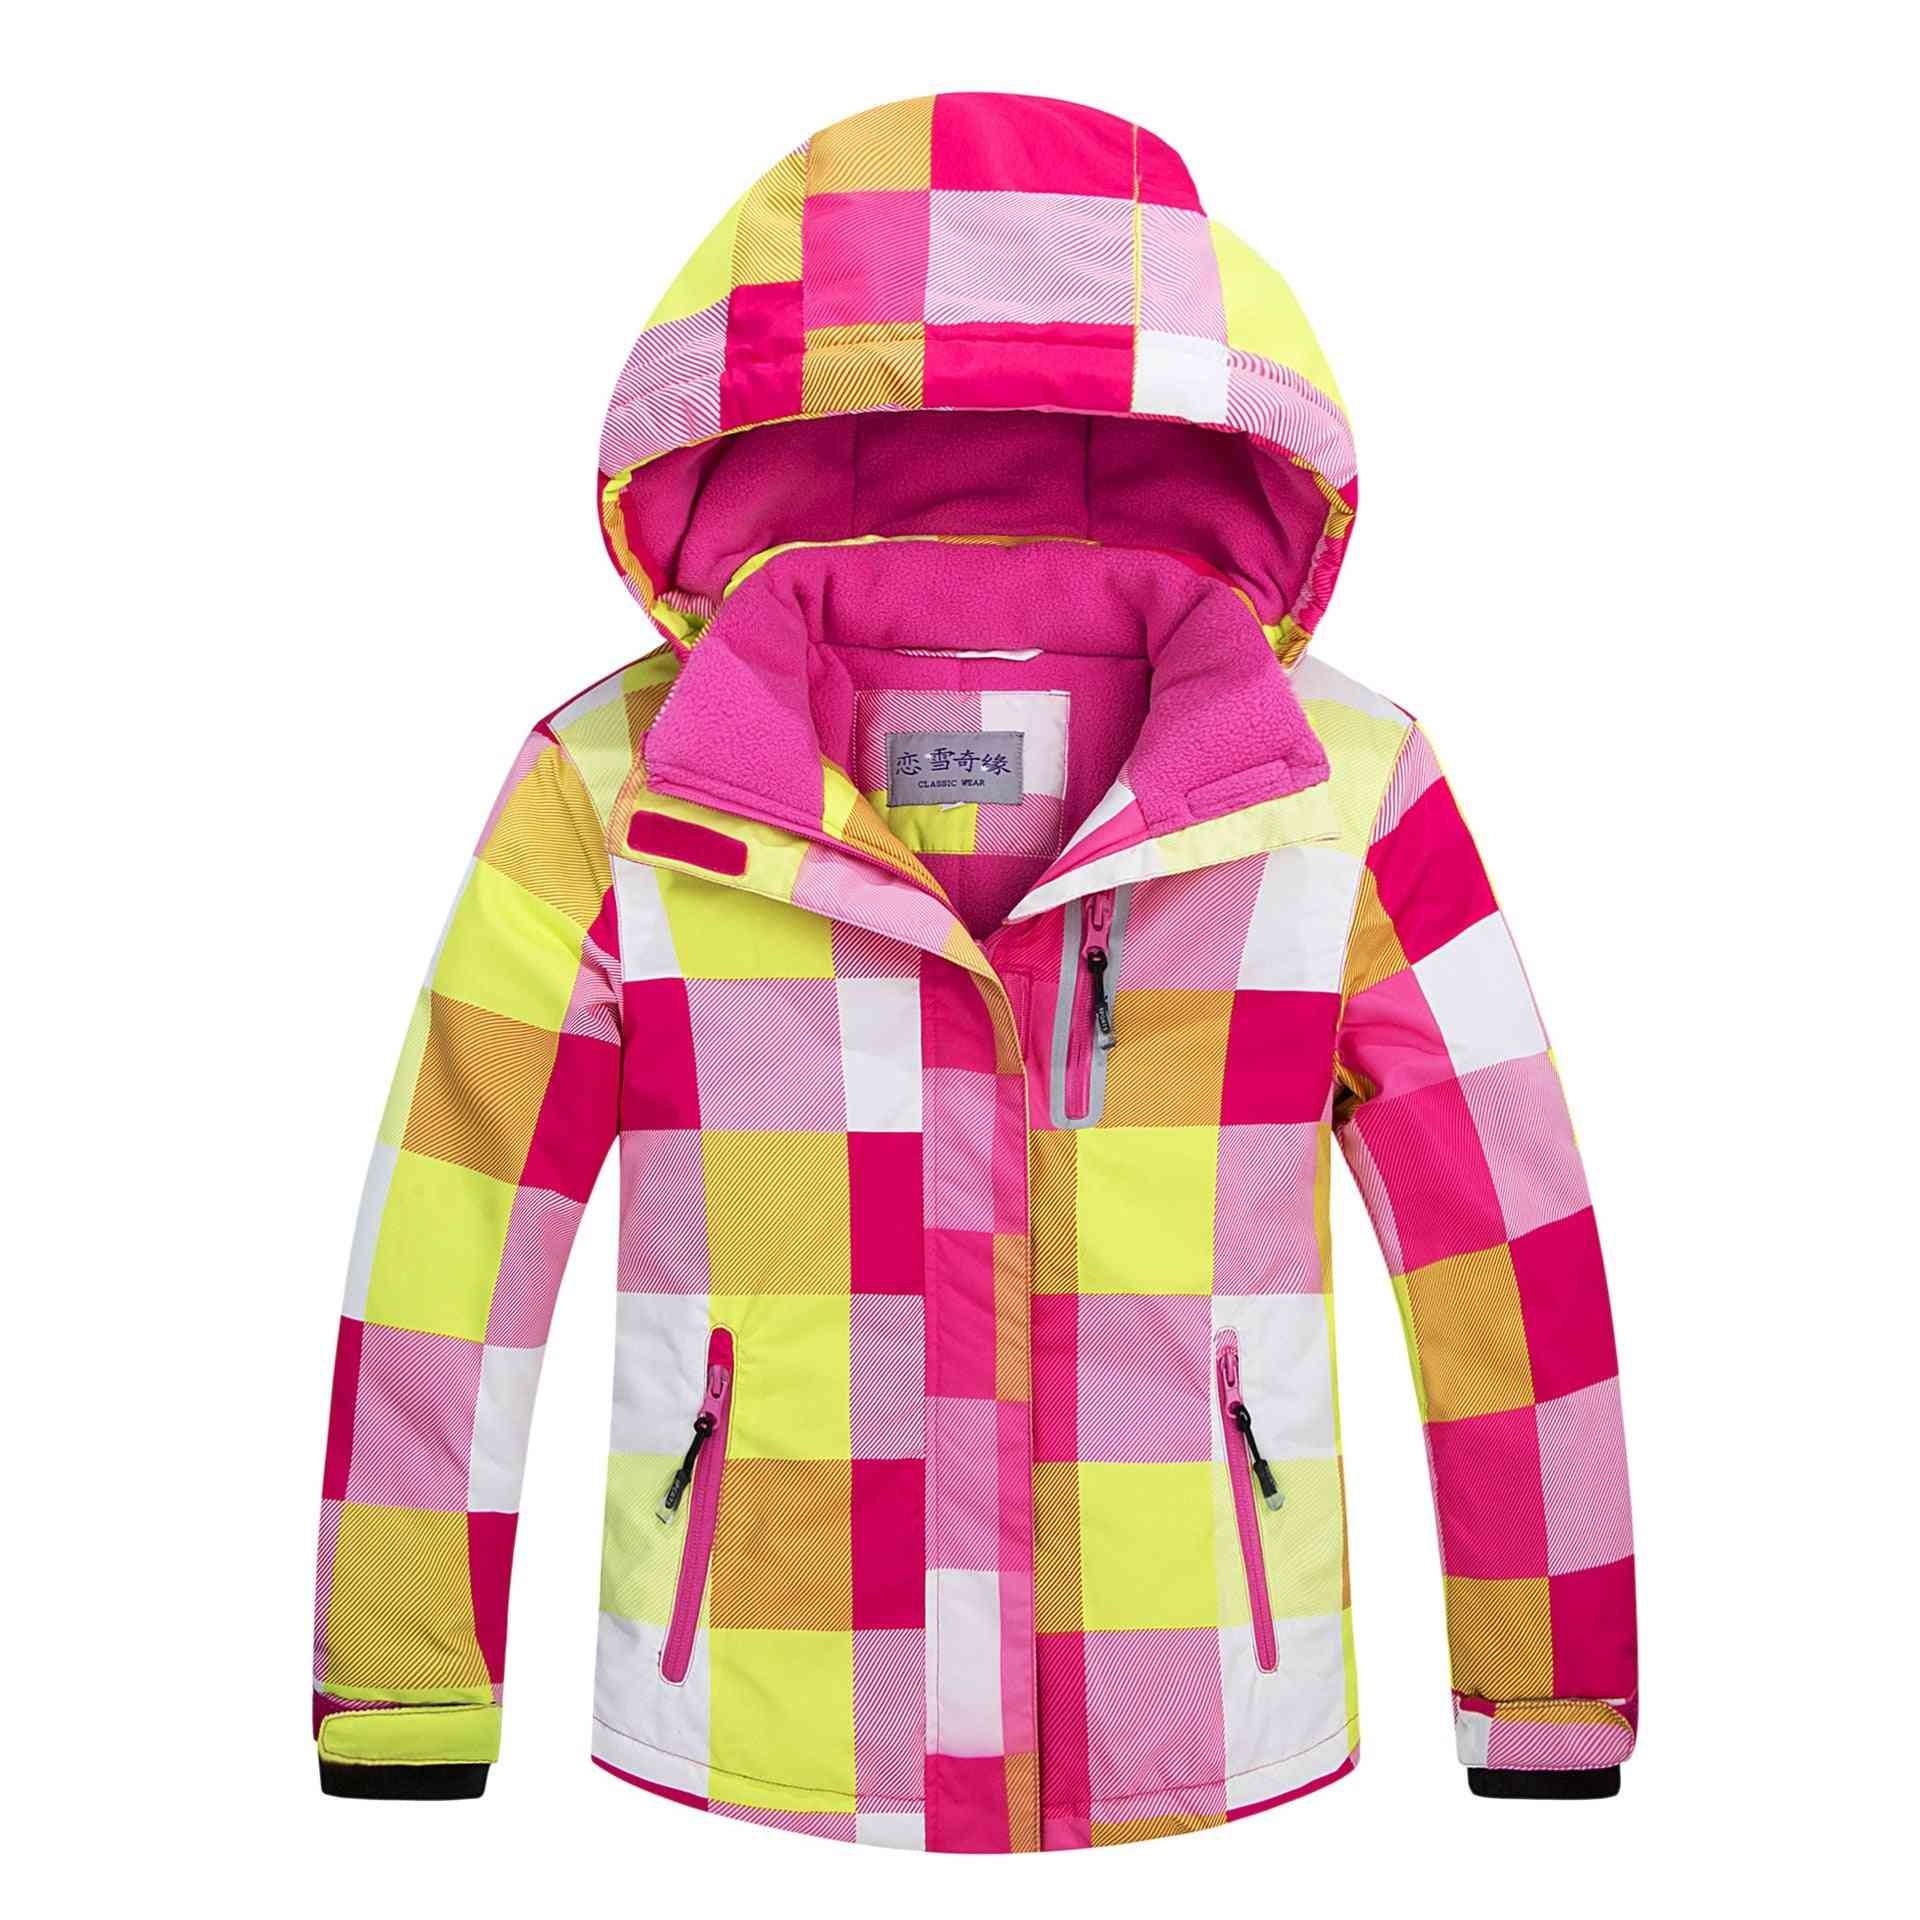 Windproof Warm Fleece Snow Jacket For Kids